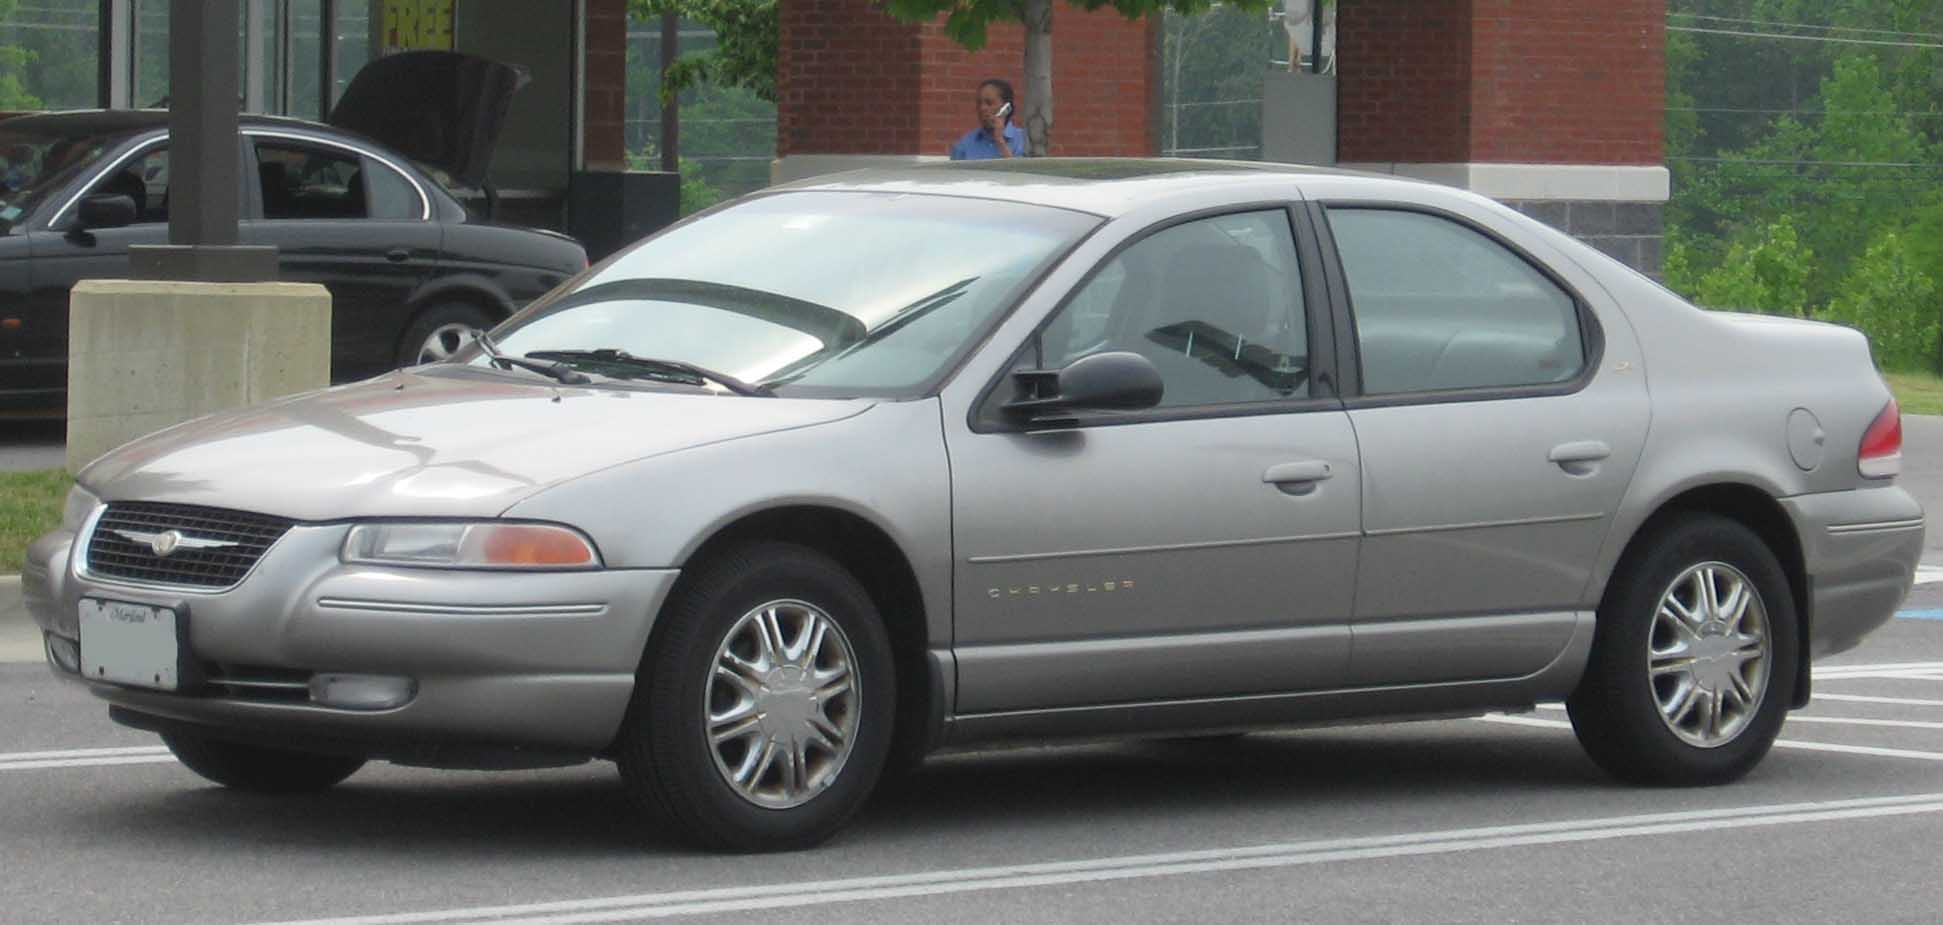 Chrysler Cirrus LXi 1999